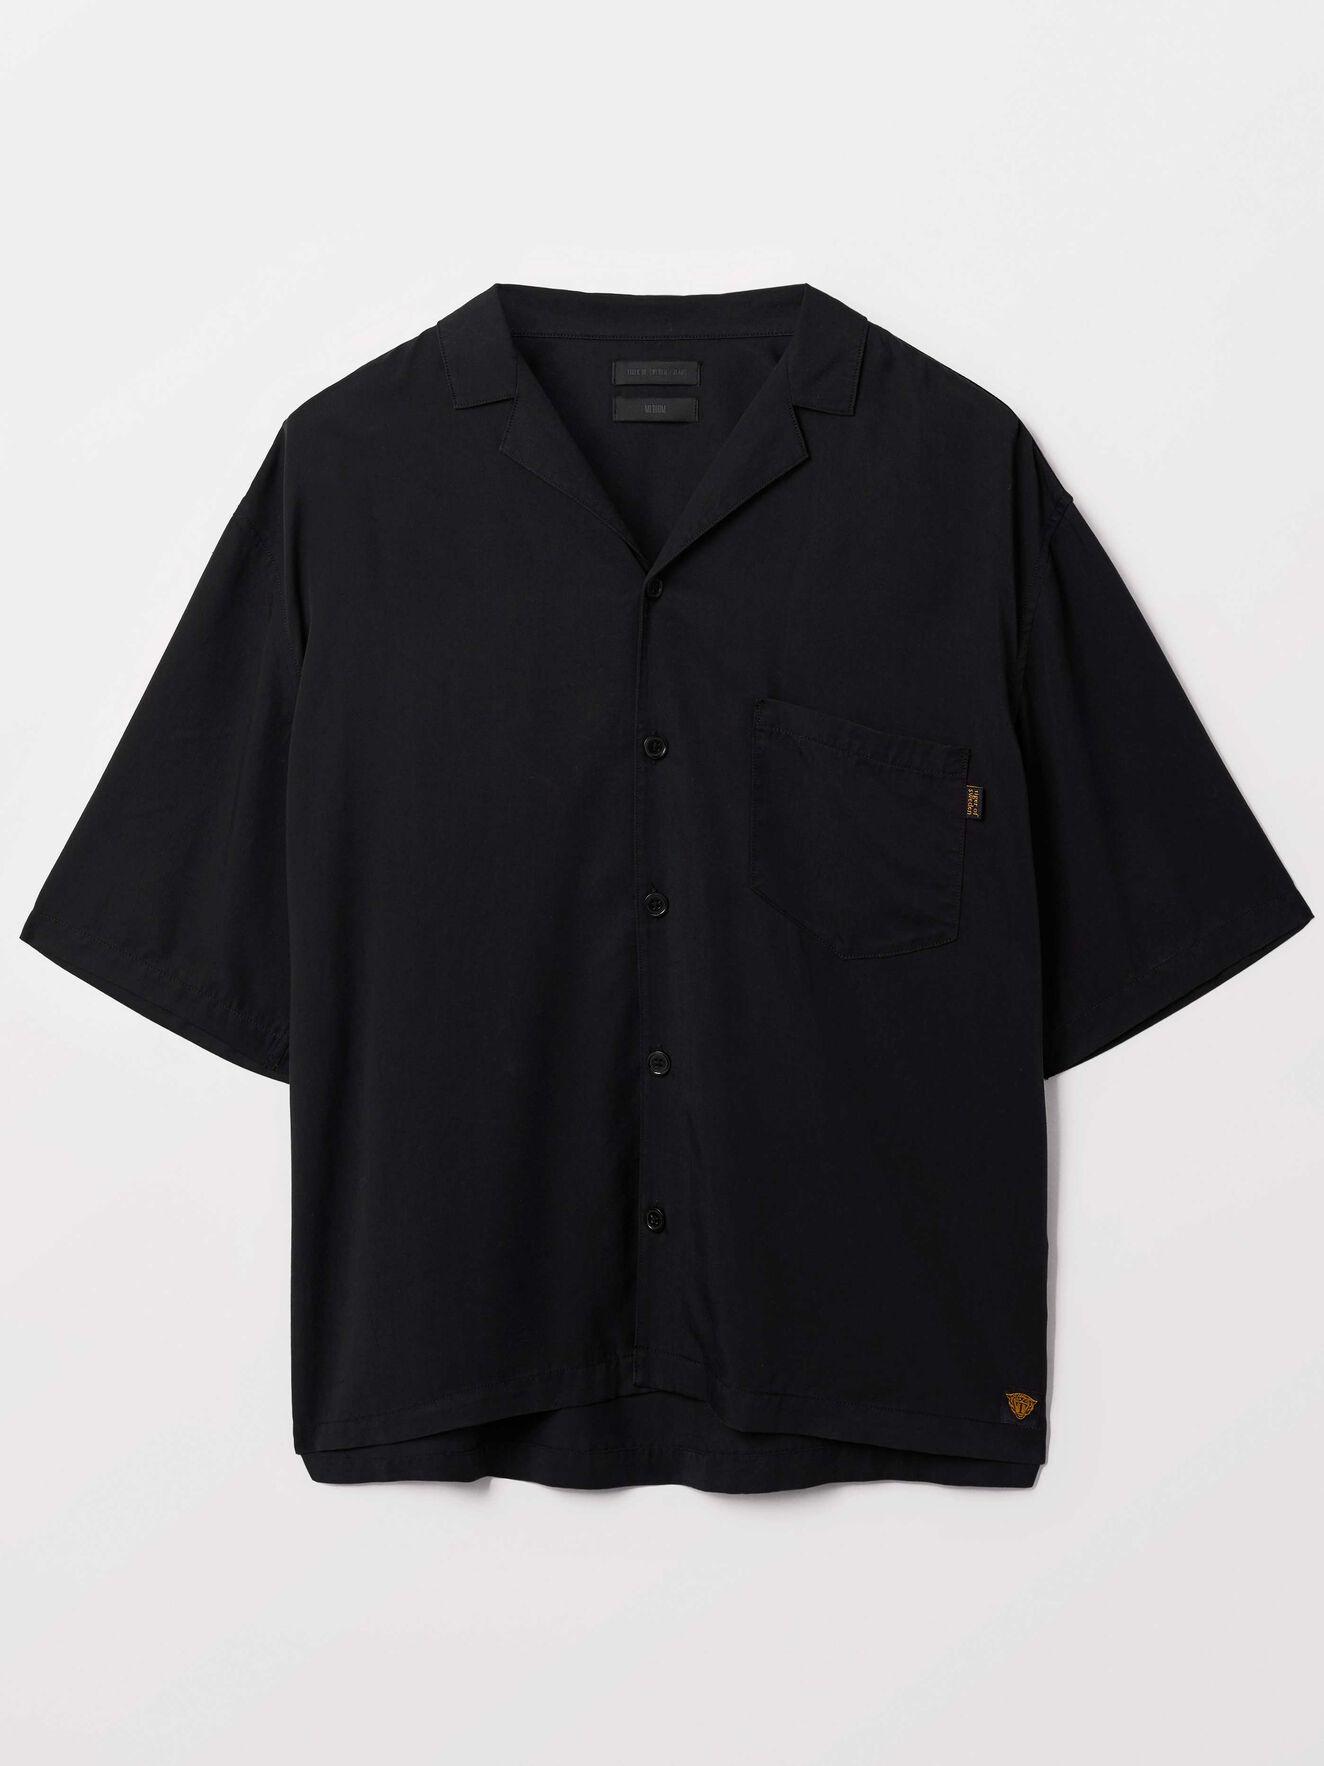 Pejer Shirt in Black from Tiger of Sweden